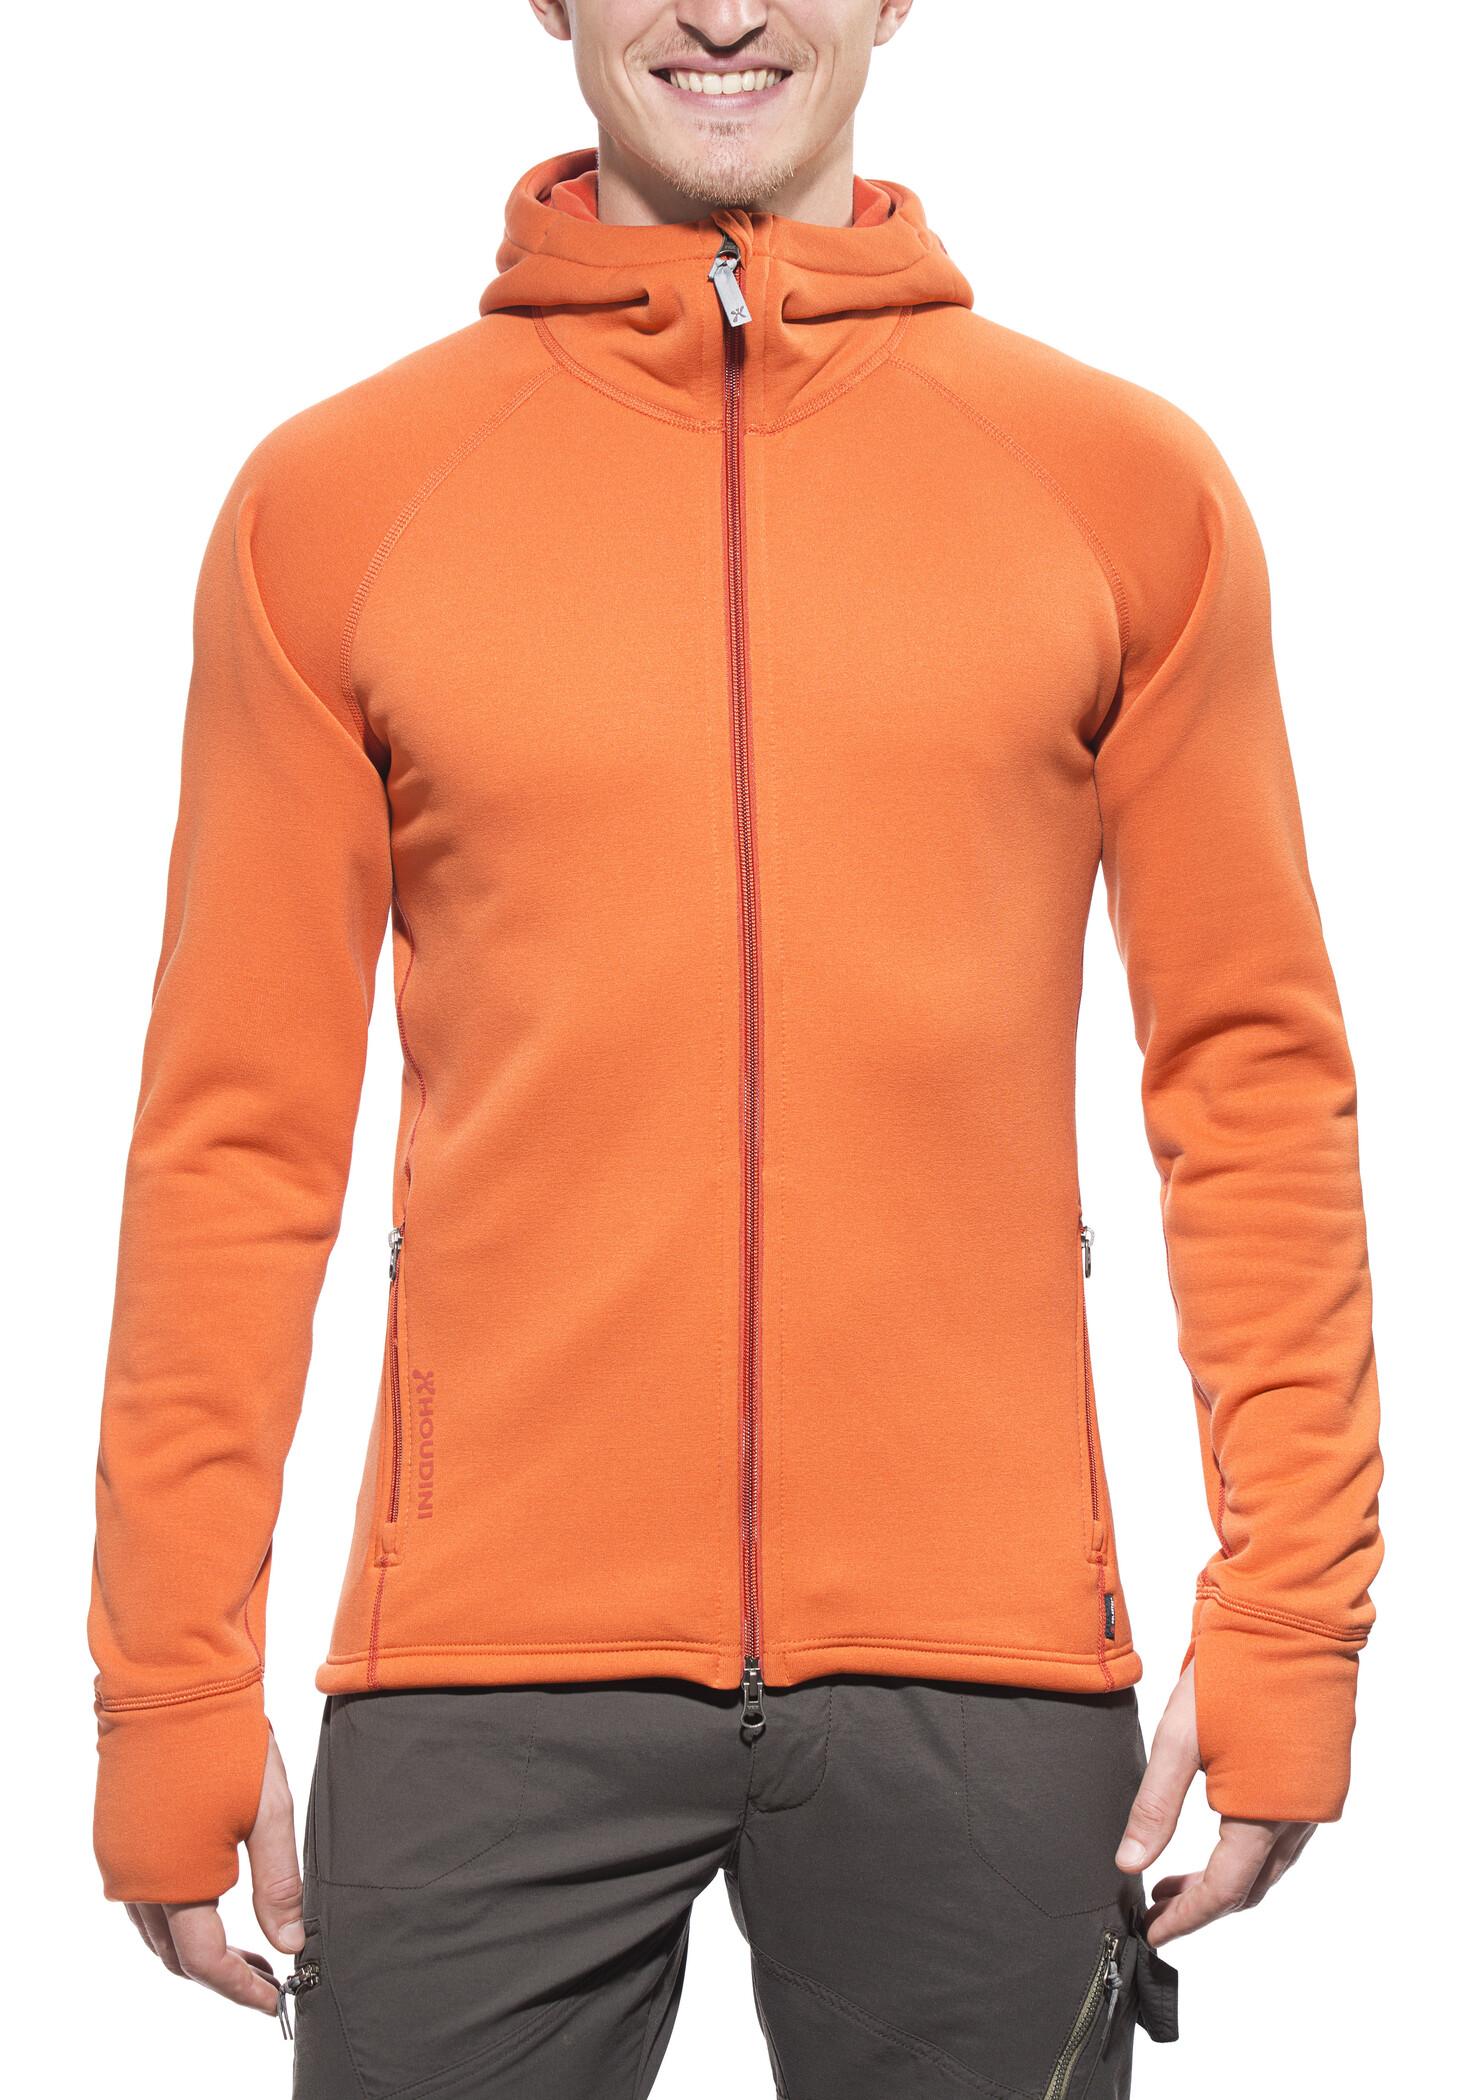 saucony vitarun jacket